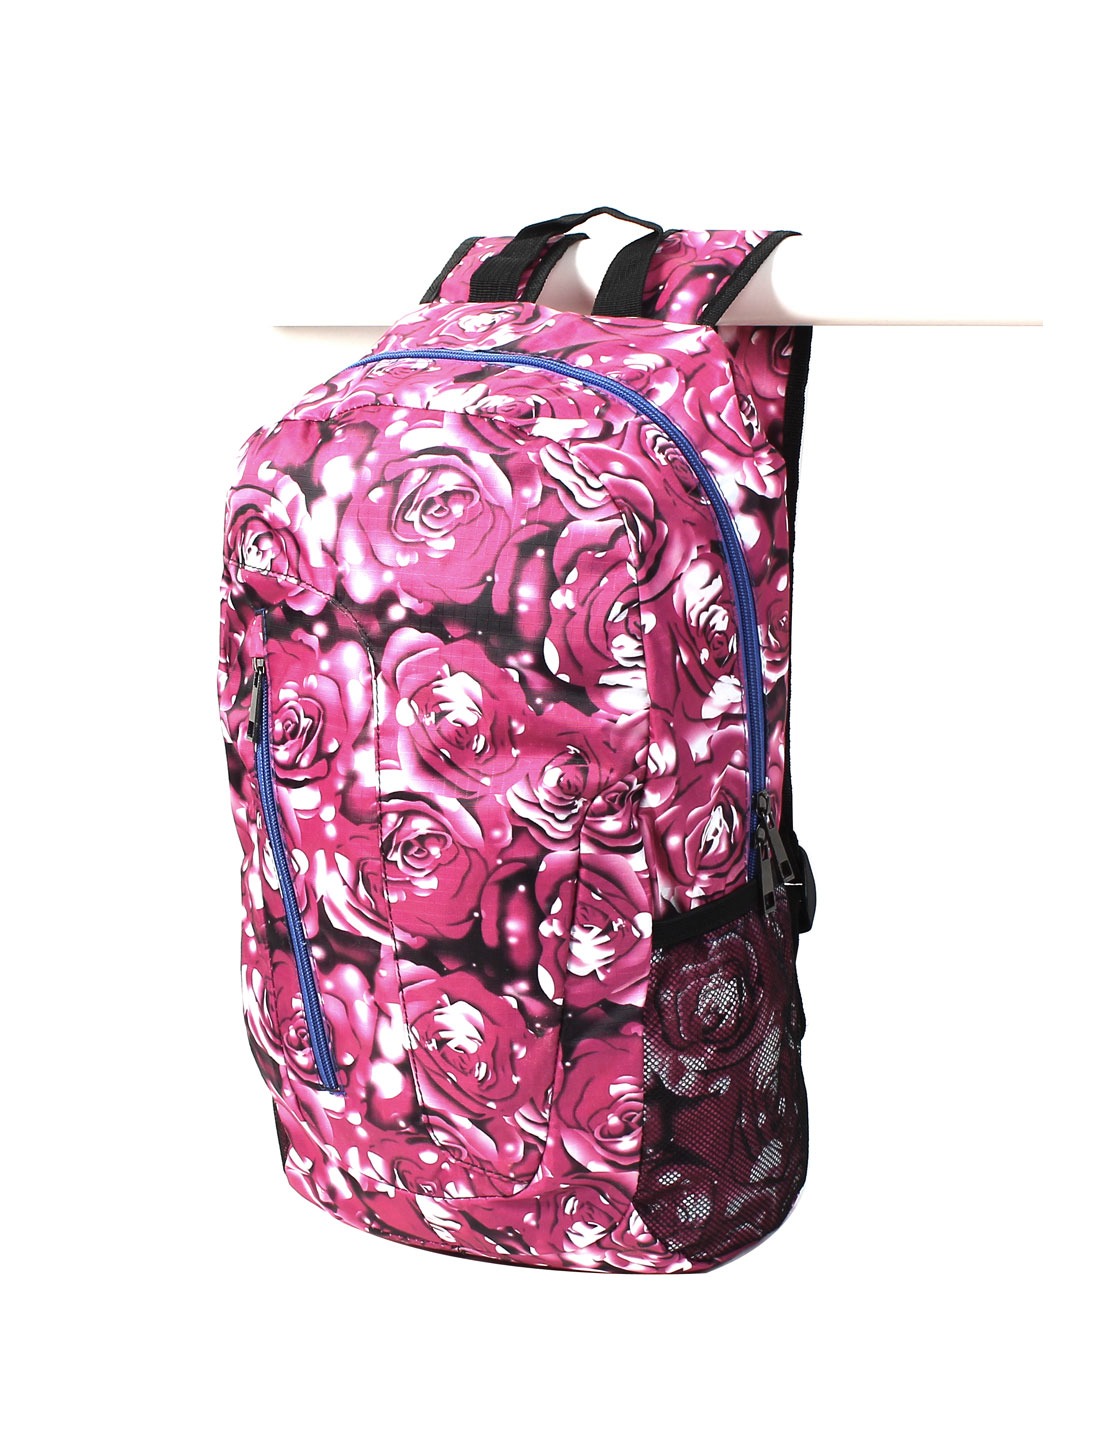 Fuchsia Florals Print Canvas Travel Camping Hiking Backpack School Shouder Bag